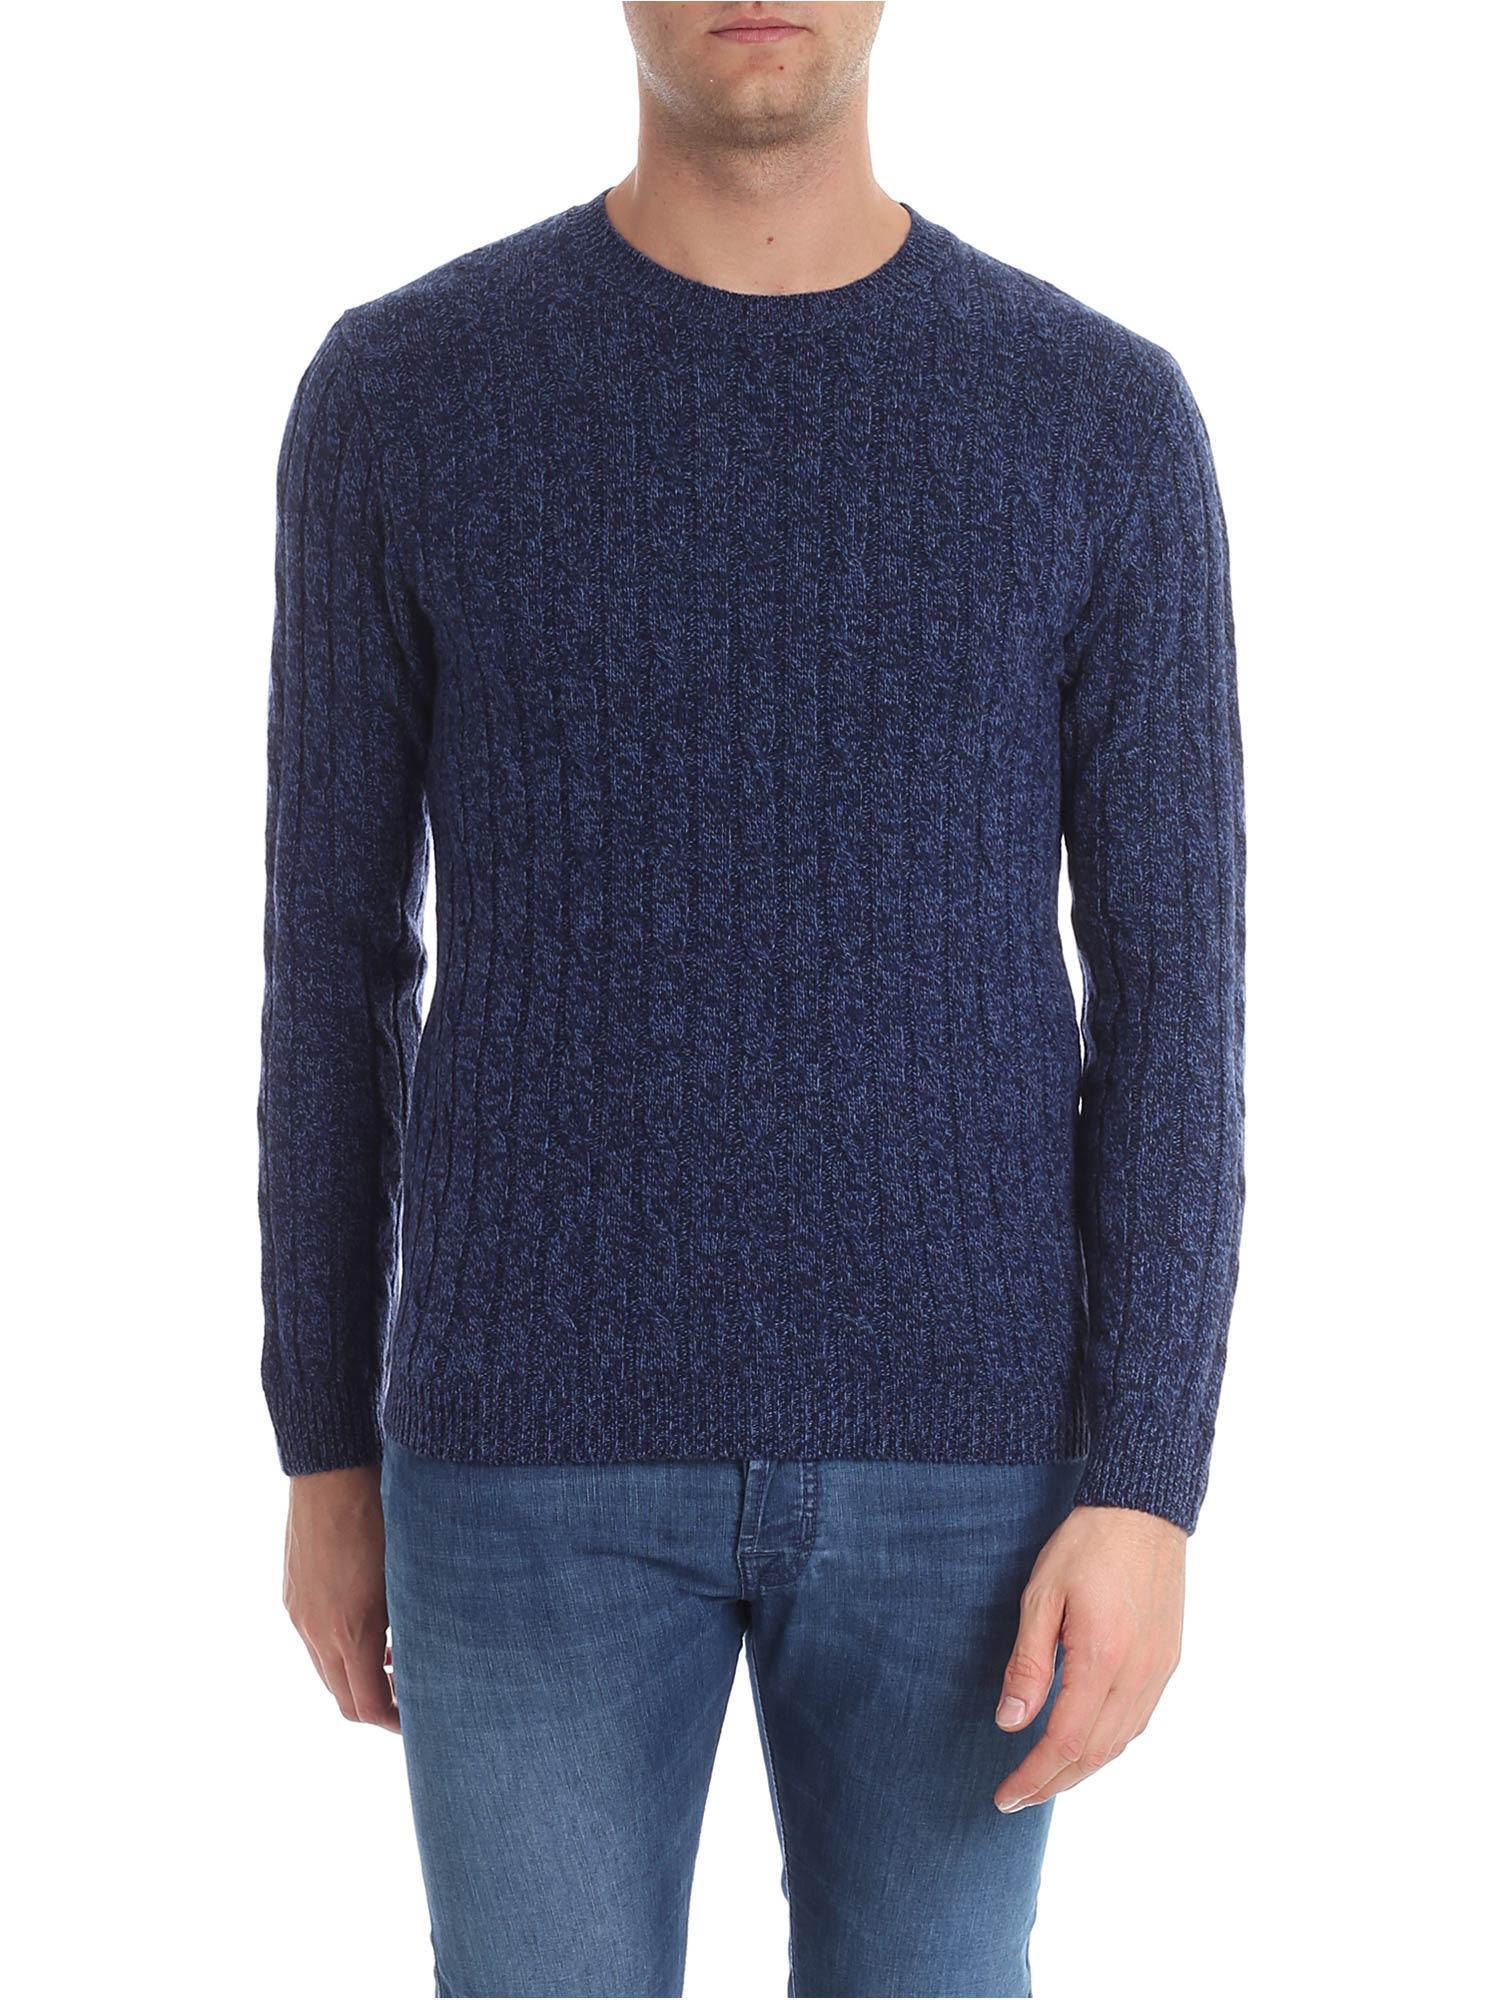 DANIELE FIESOLI Cashemere And Merino Wool Sweater in Blue